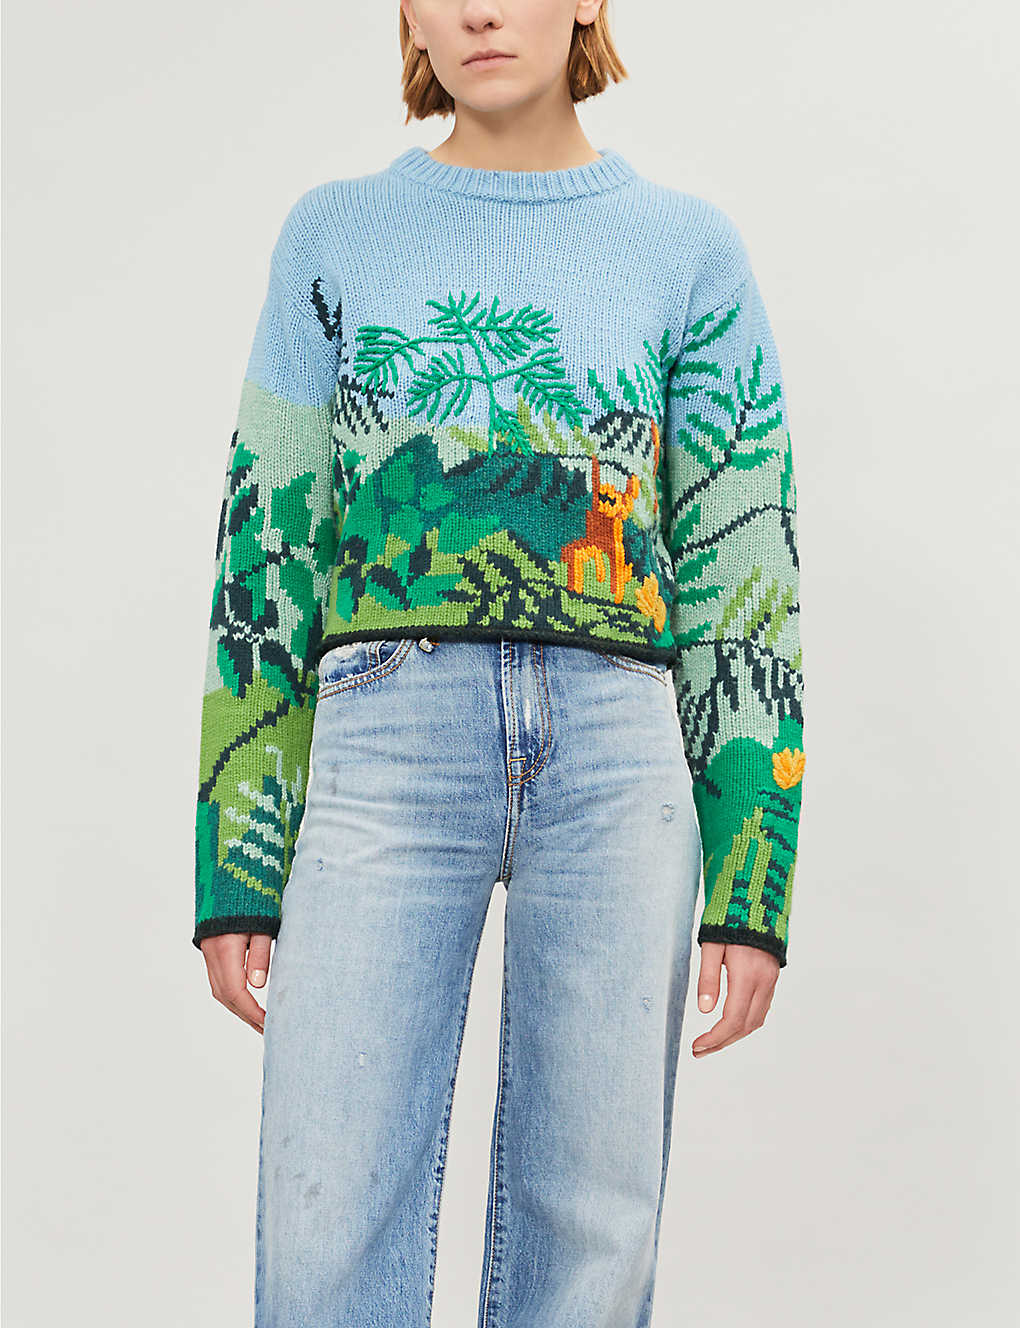 944b0bf8e KENZO - Jungle-instarsia wool-blend jumper | Selfridges.com